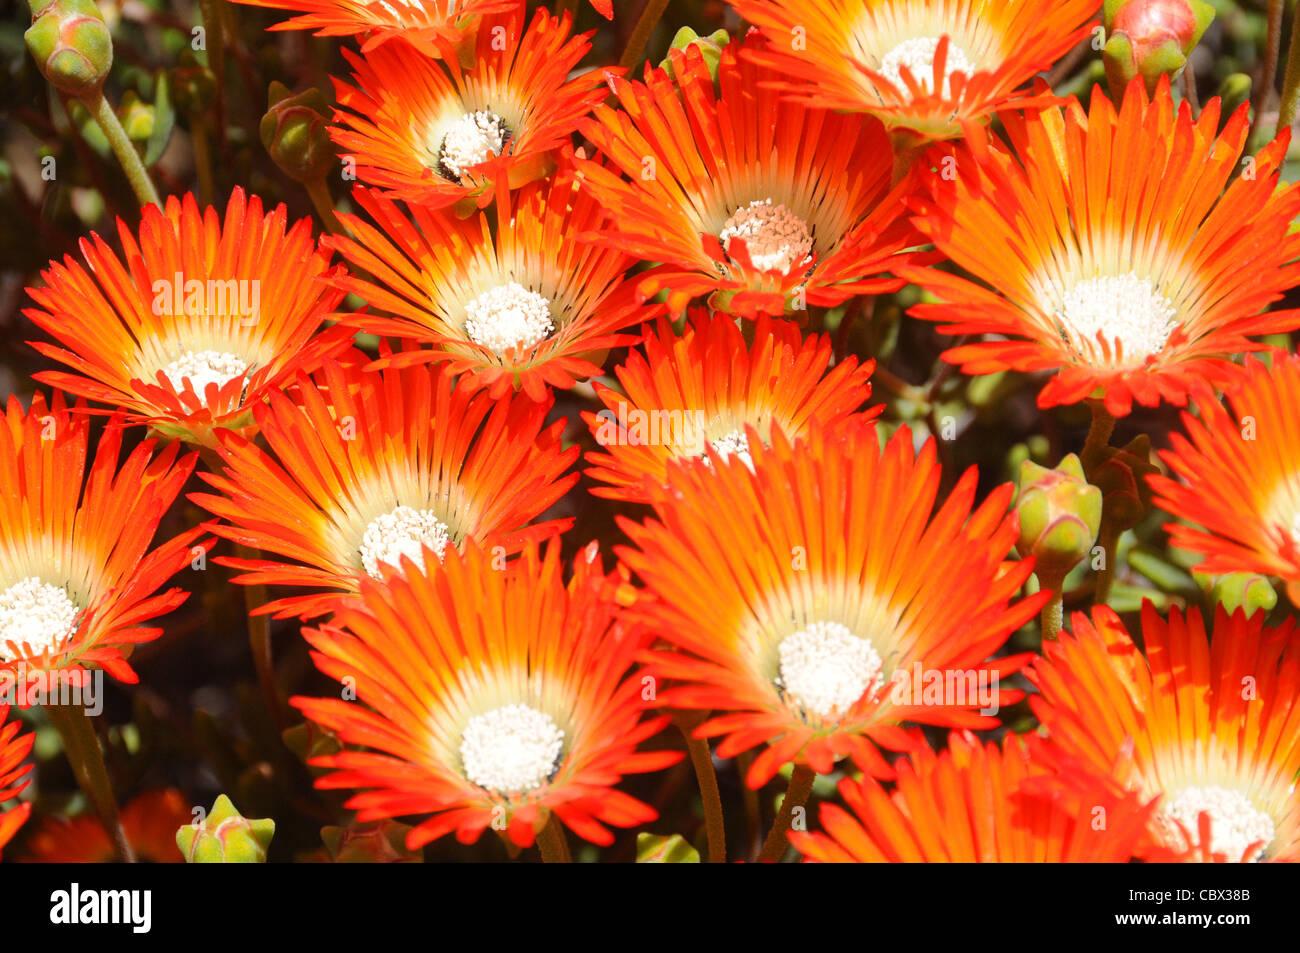 Deep orange vygie Lampranthus aurantiacus flowering profusely after good rains in the semi-desert karoo, South Africa - Stock Image